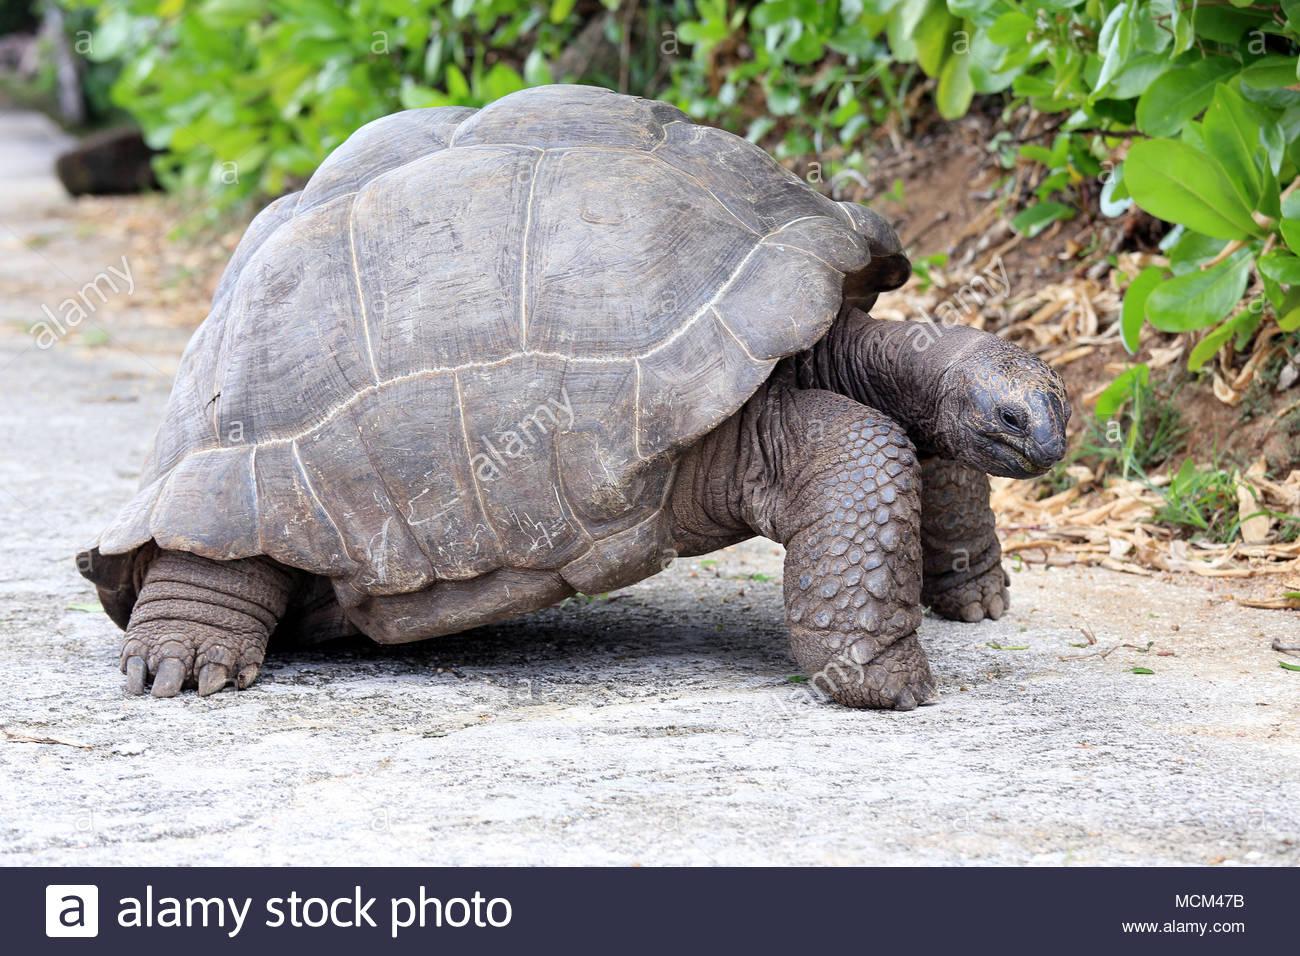 Seychelles Giant Tortoise - Stock Image